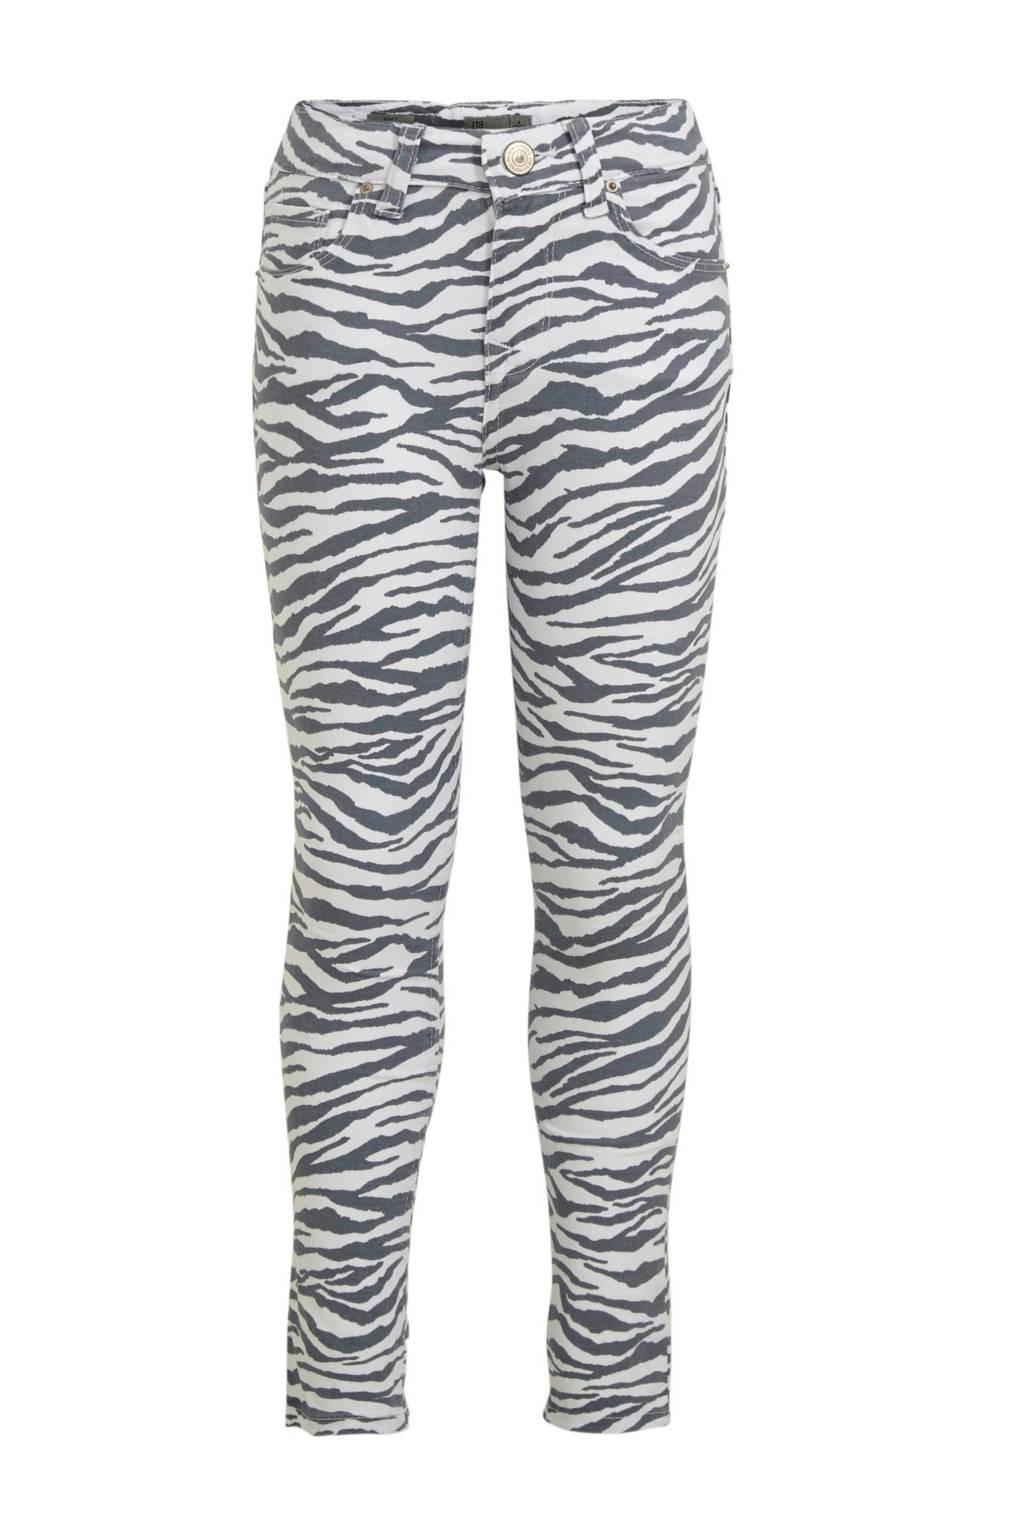 LTB skinny broek Amy met zebraprint wit/antraciet, Wit/antraciet